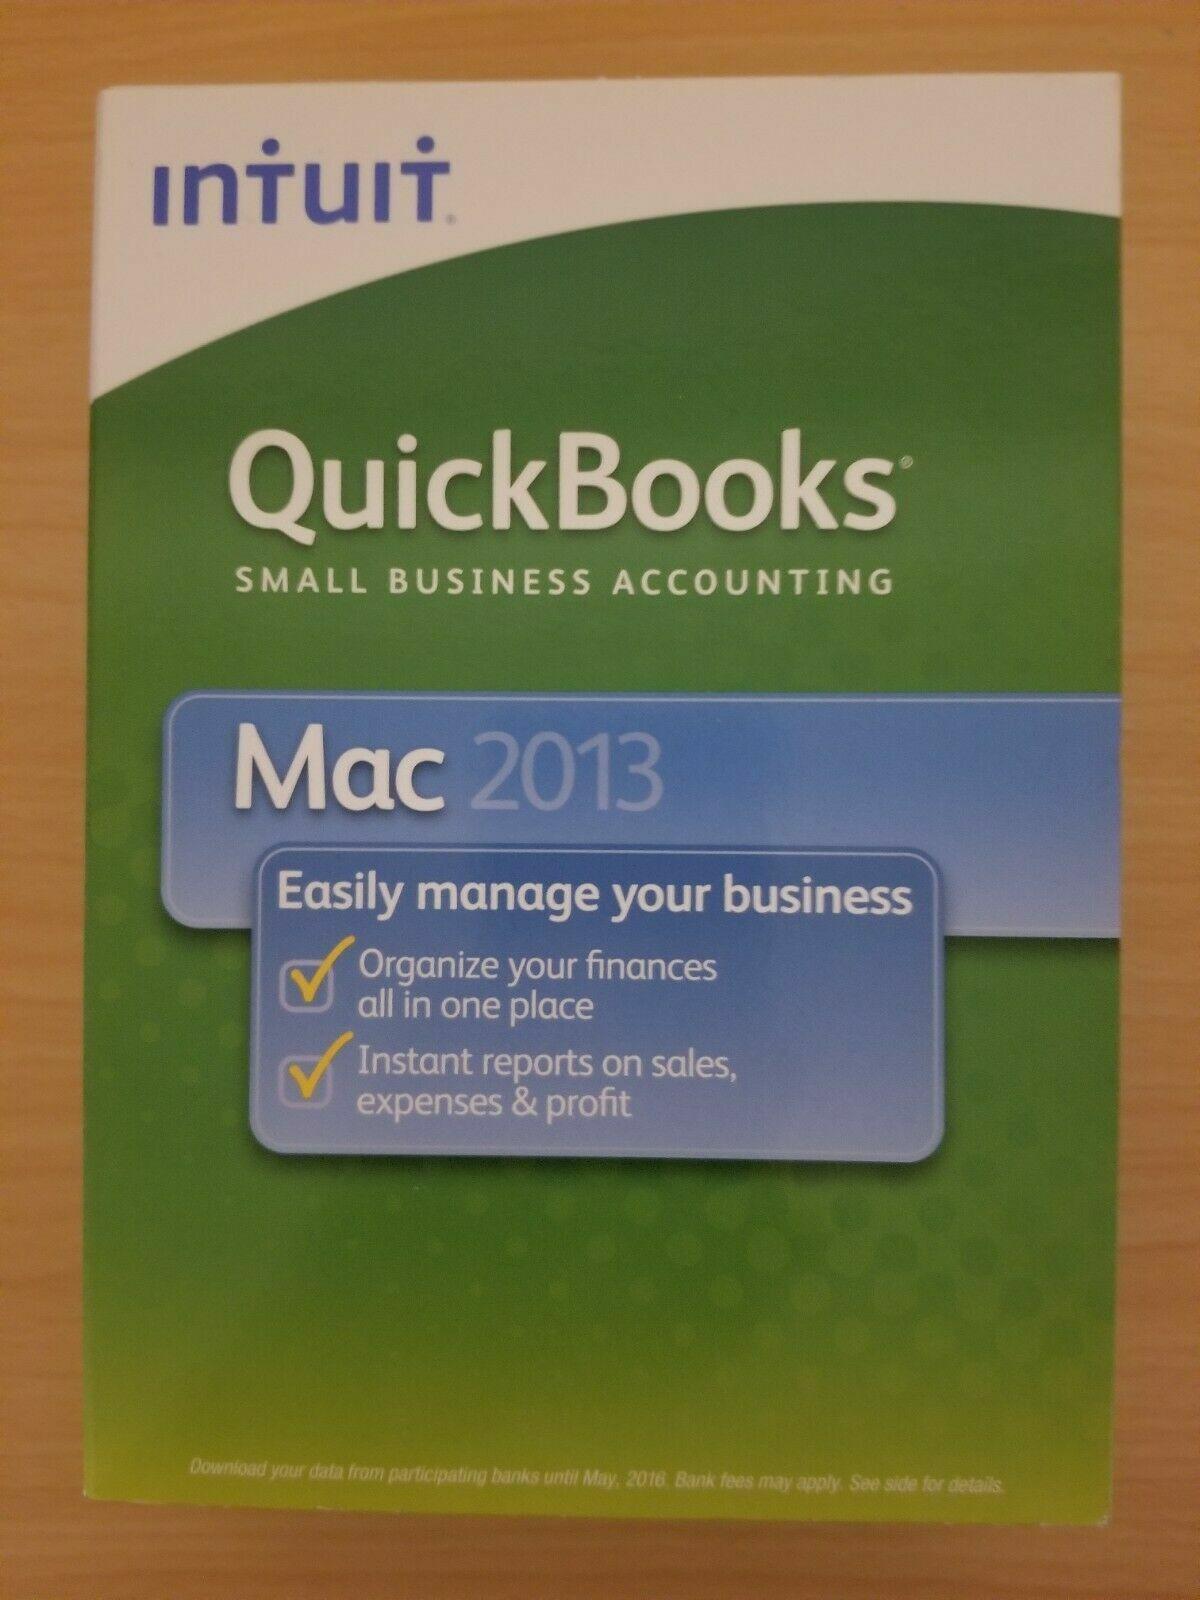 INTUIT QUICKBOOKS MAC 2013 FULL RETAIL USA VERSION =BRAND NEW BOX=